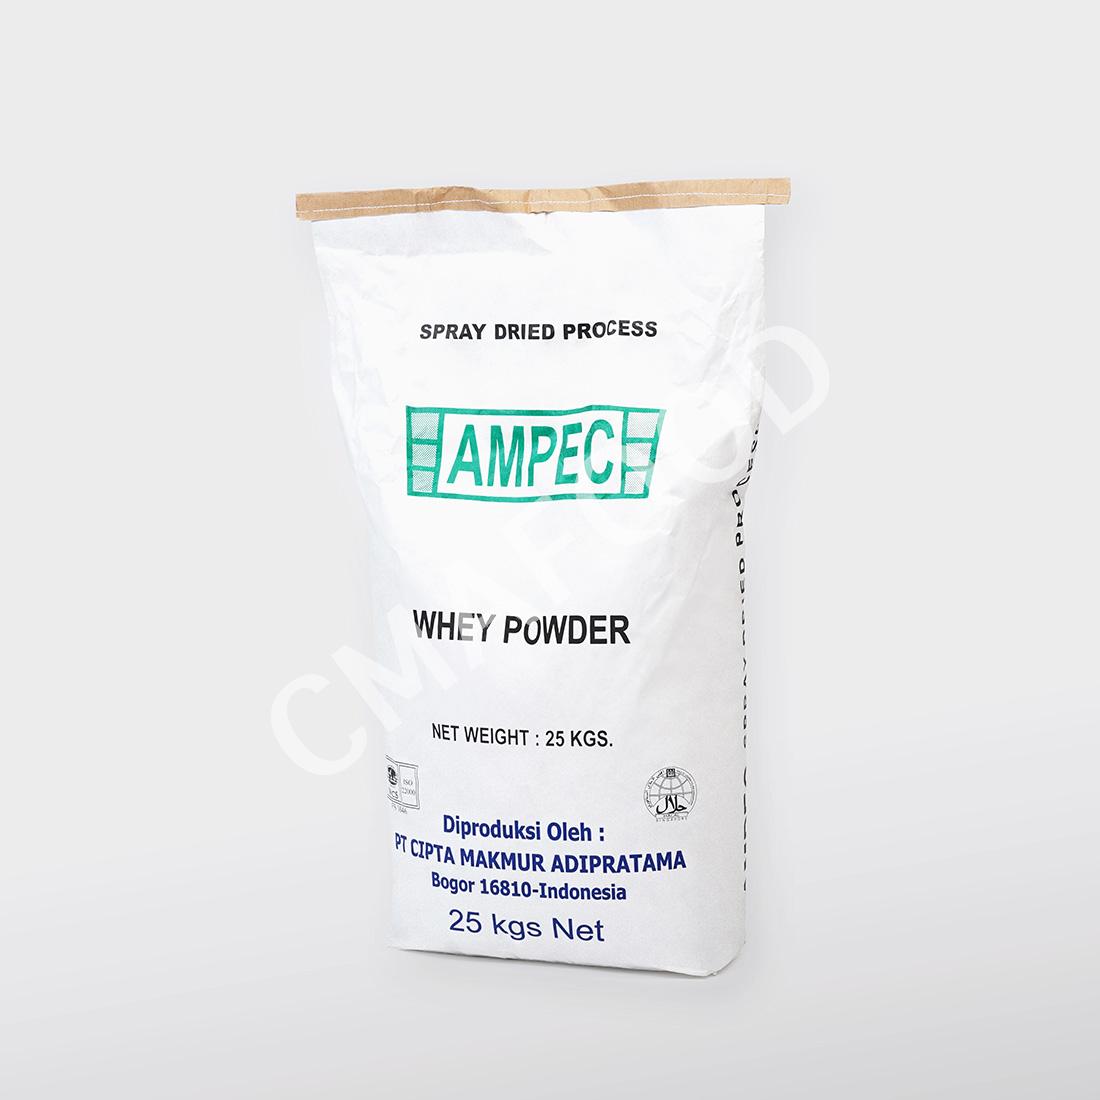 Ampec Whey Milk Powder Photo 0